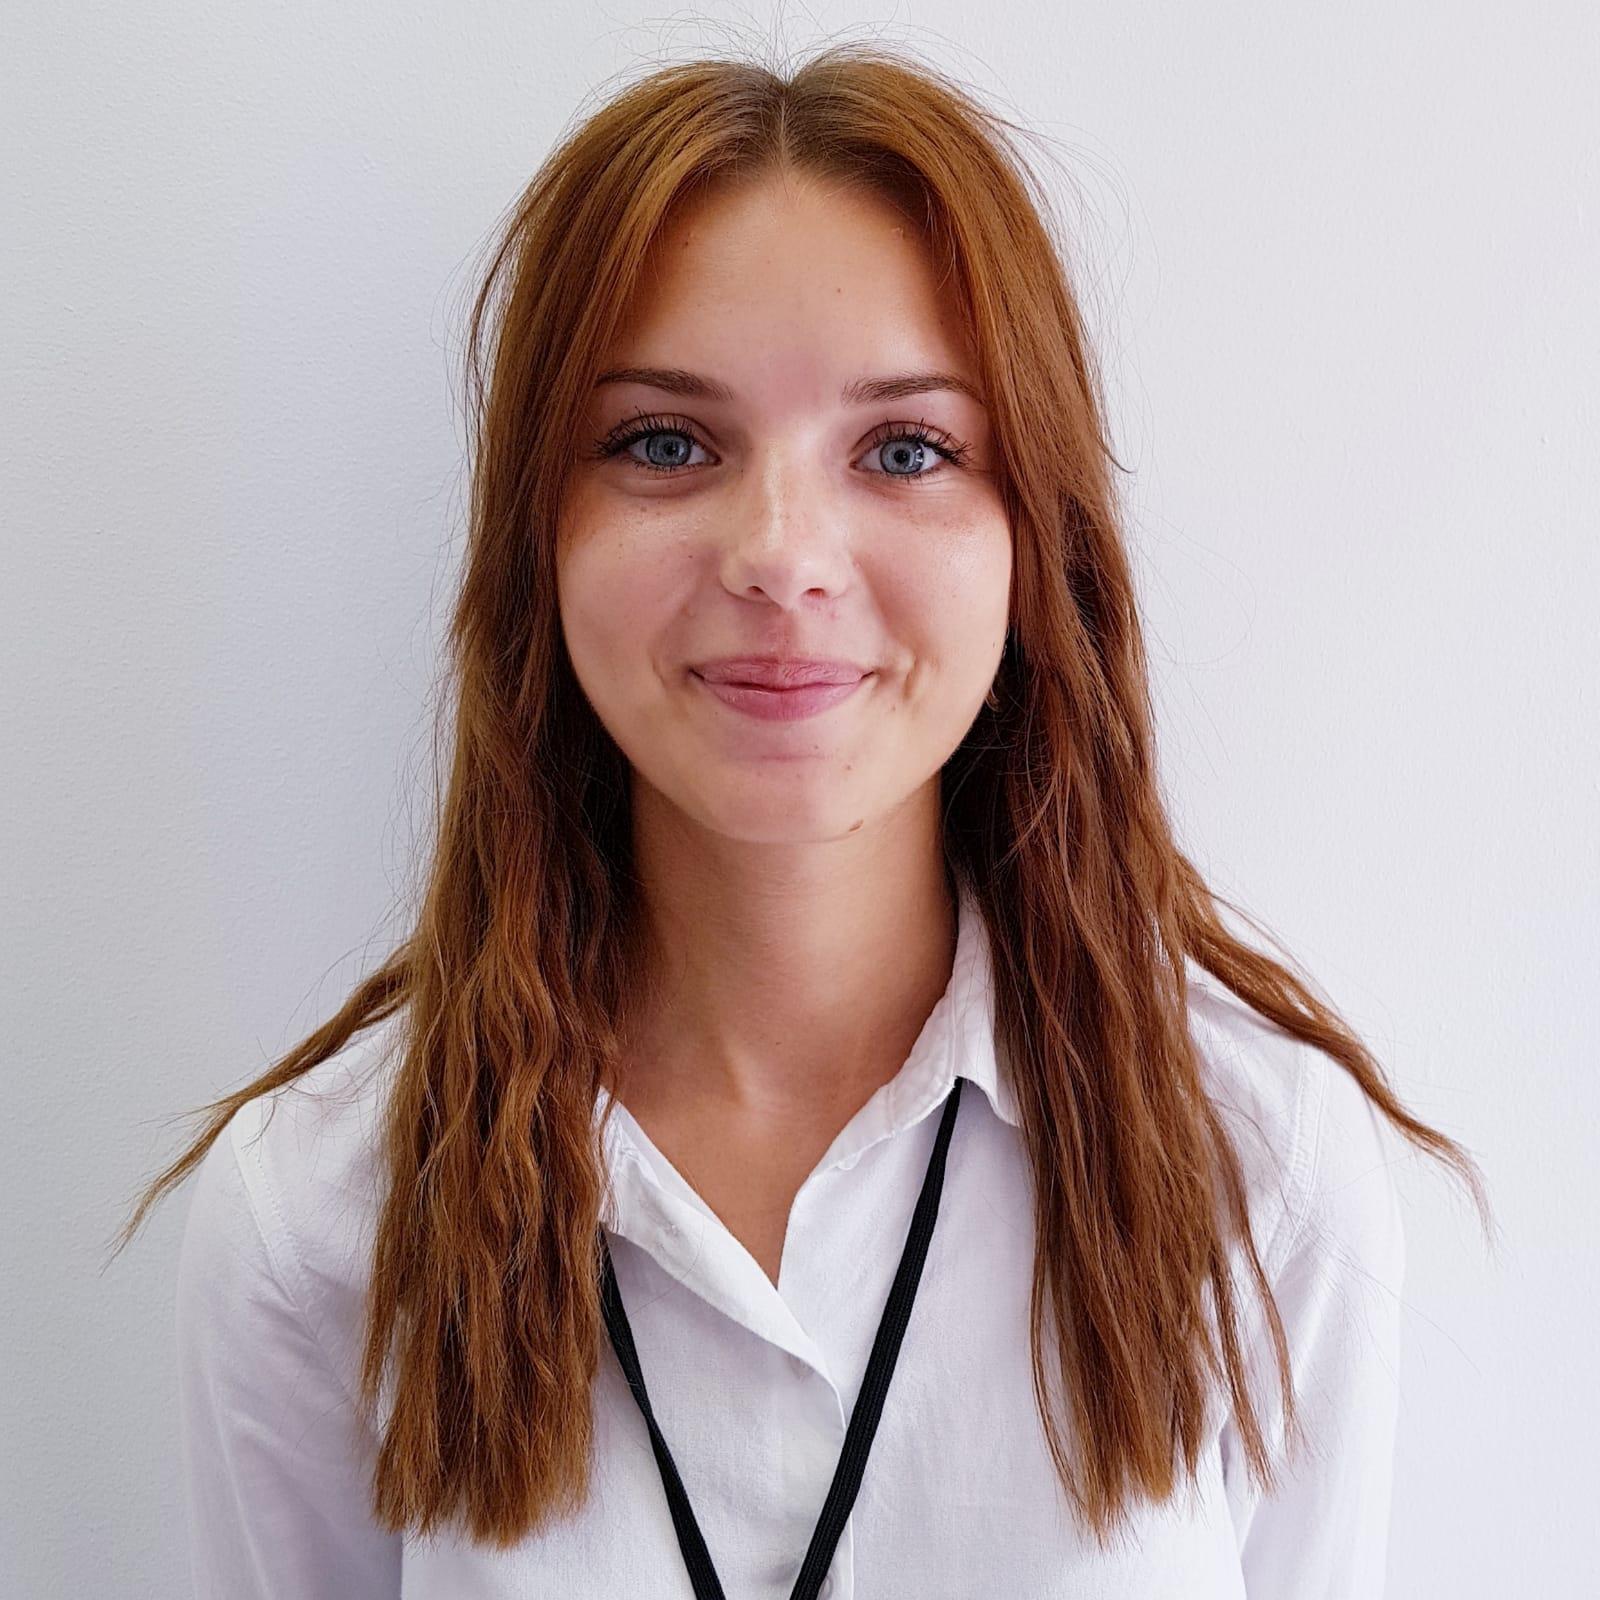 Elisa Andersen